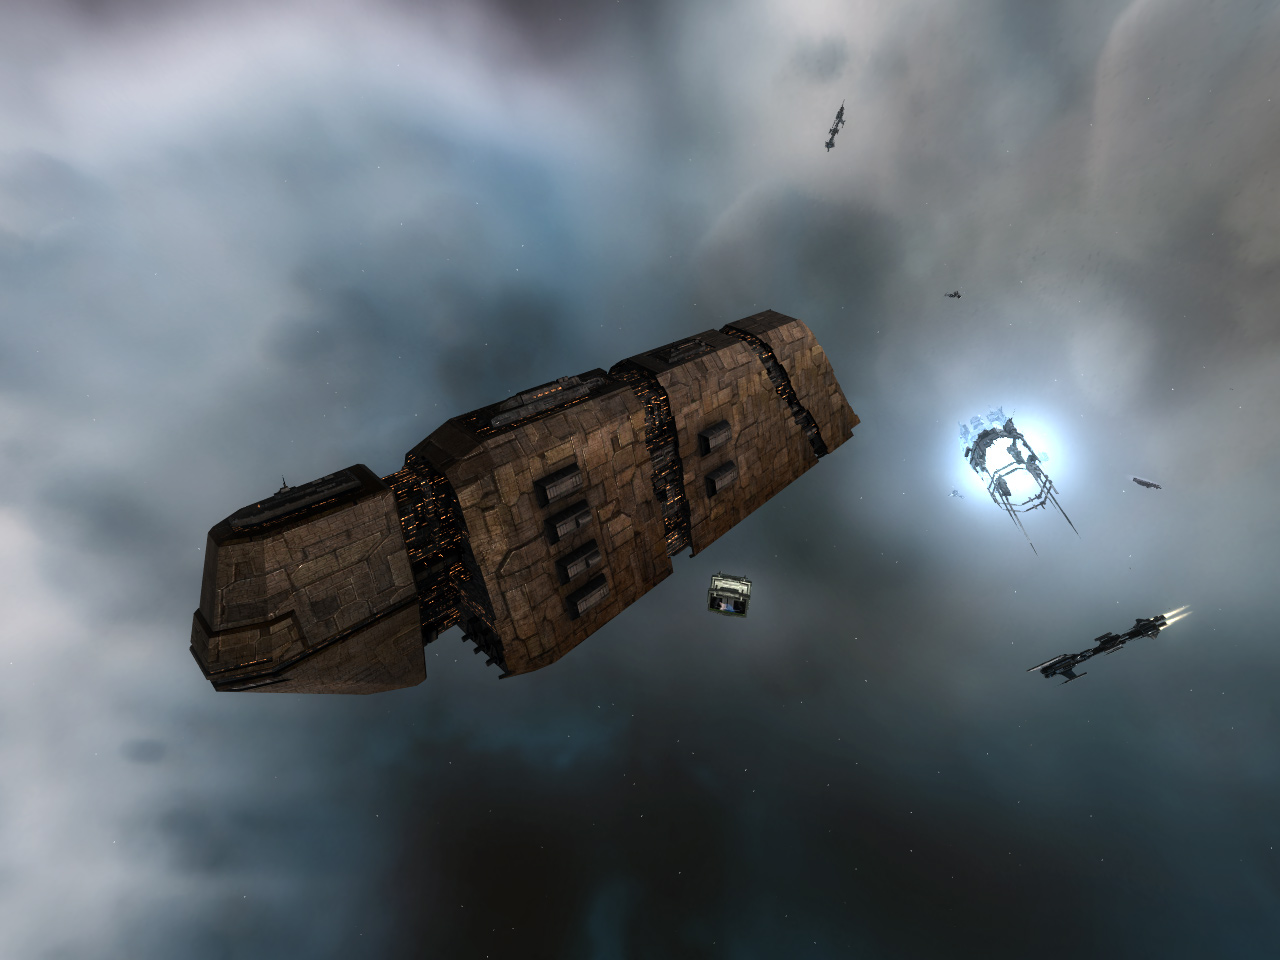 Freighter  - one to choose  - Providence, Charon, Obelisk, Fenrir